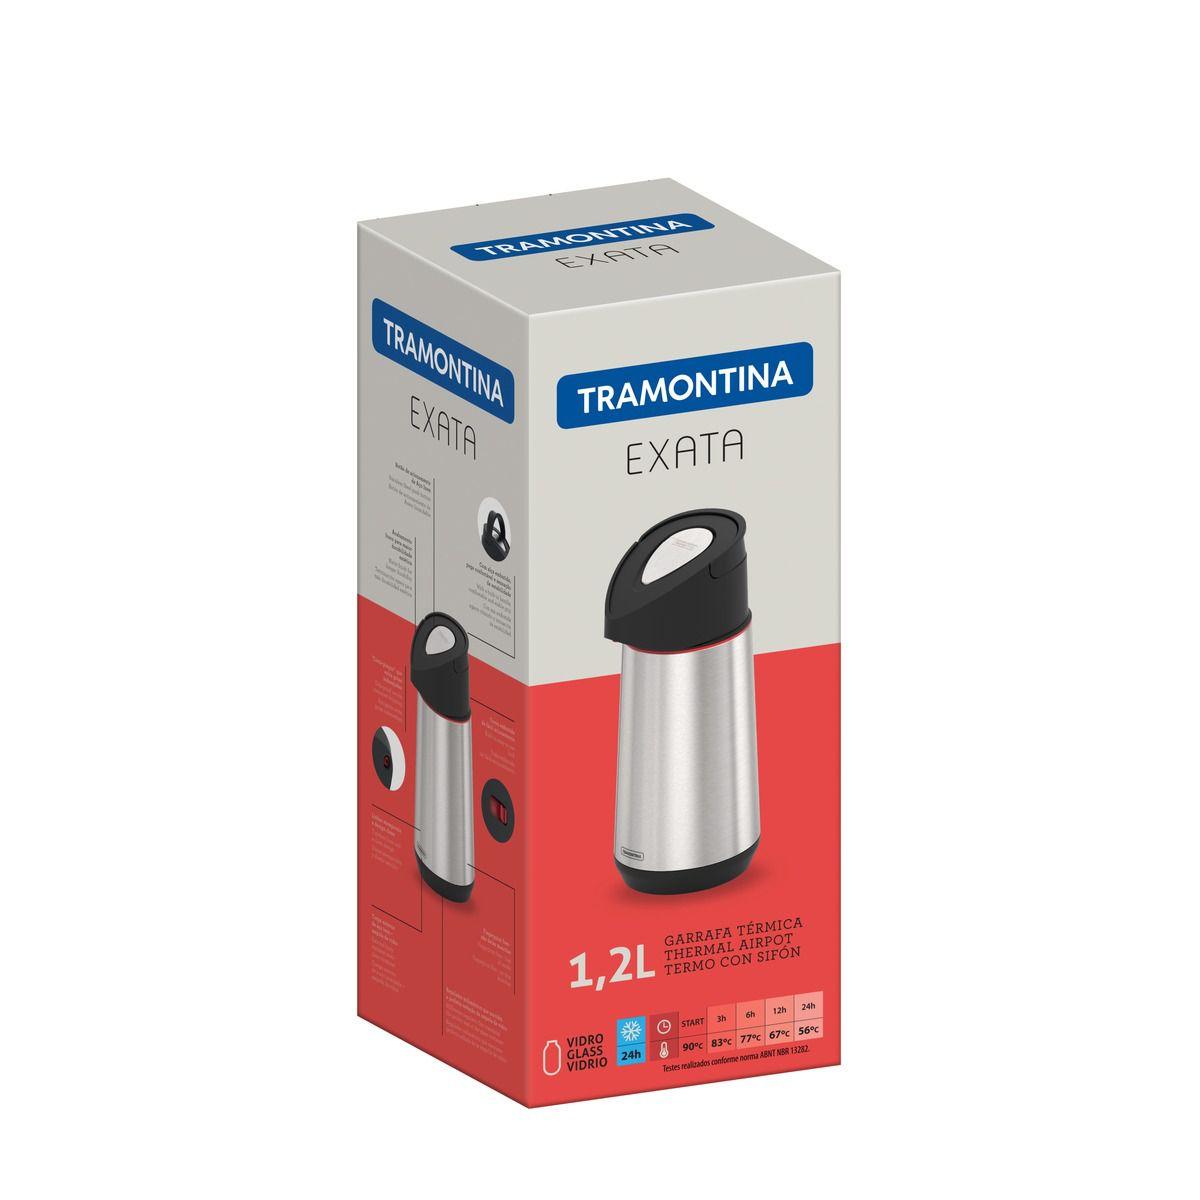 Garrafa Térmica Tramontina Exata em Aço Inox com Ampola de Vidro 1,2 L 61641/120 | Lojas Estrela